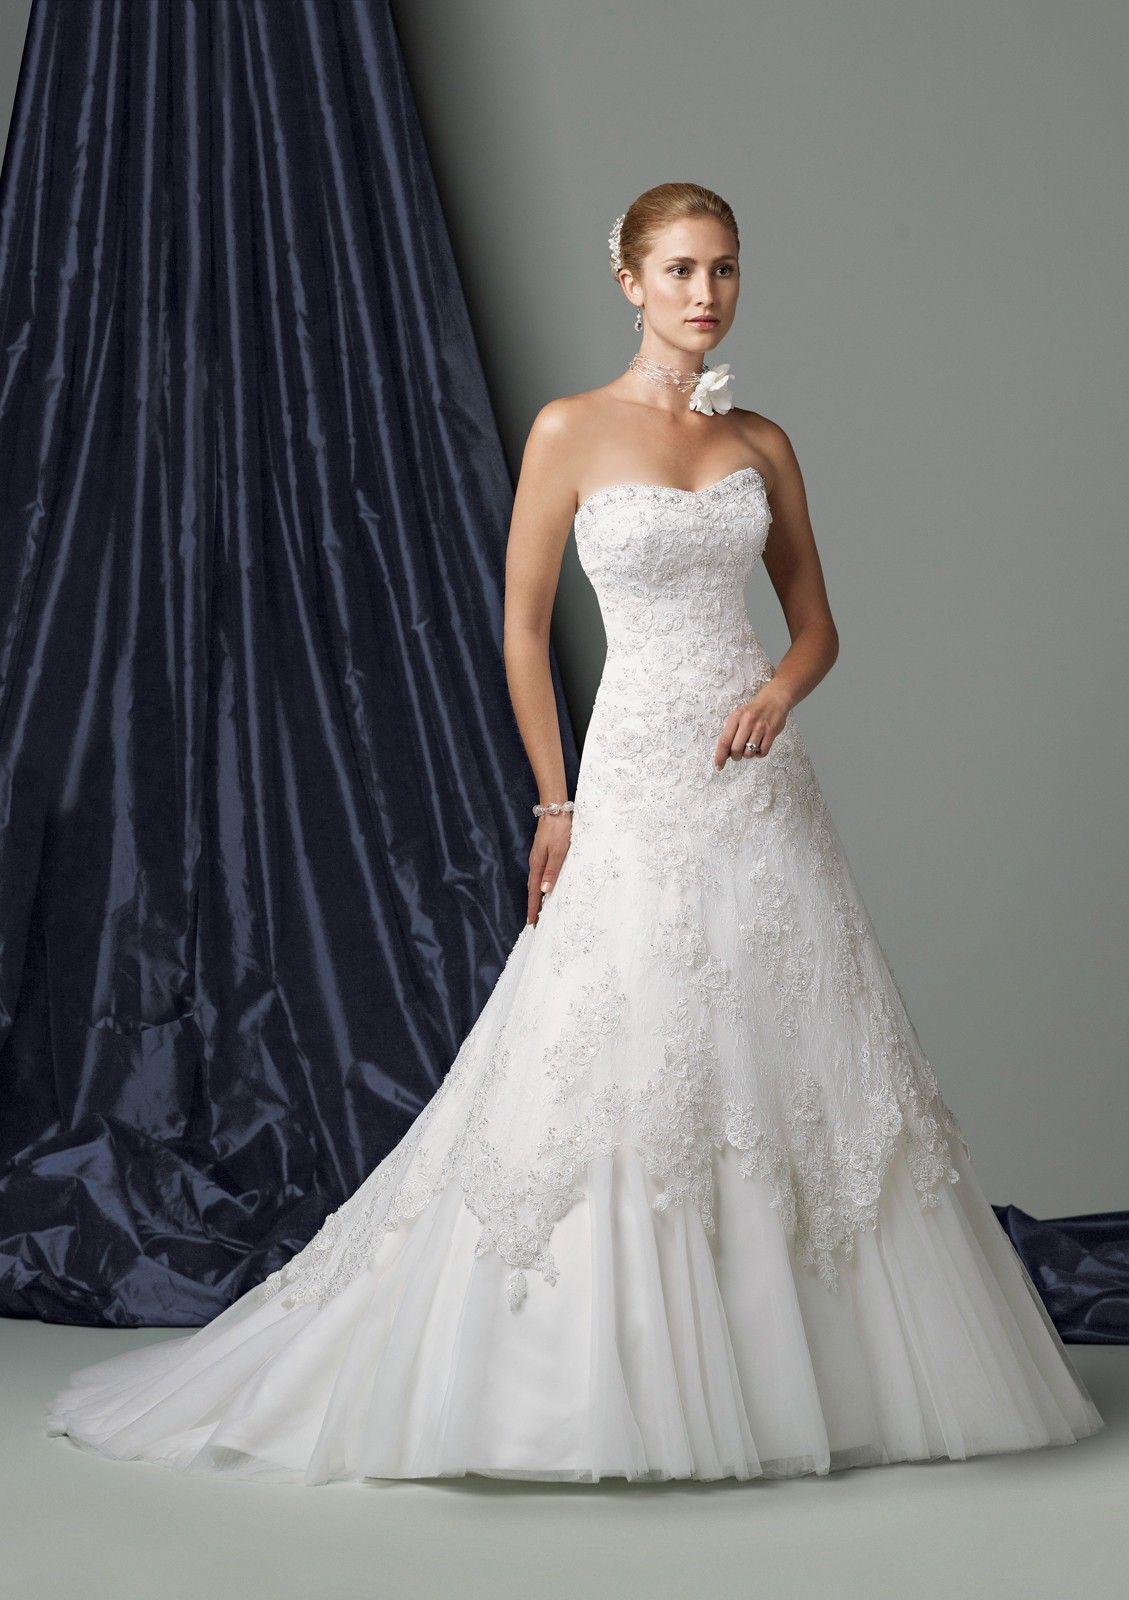 strapless wedding dresses Strapless Wedding Dresses Are The Bride s 1 Dress Choice StyleKuw